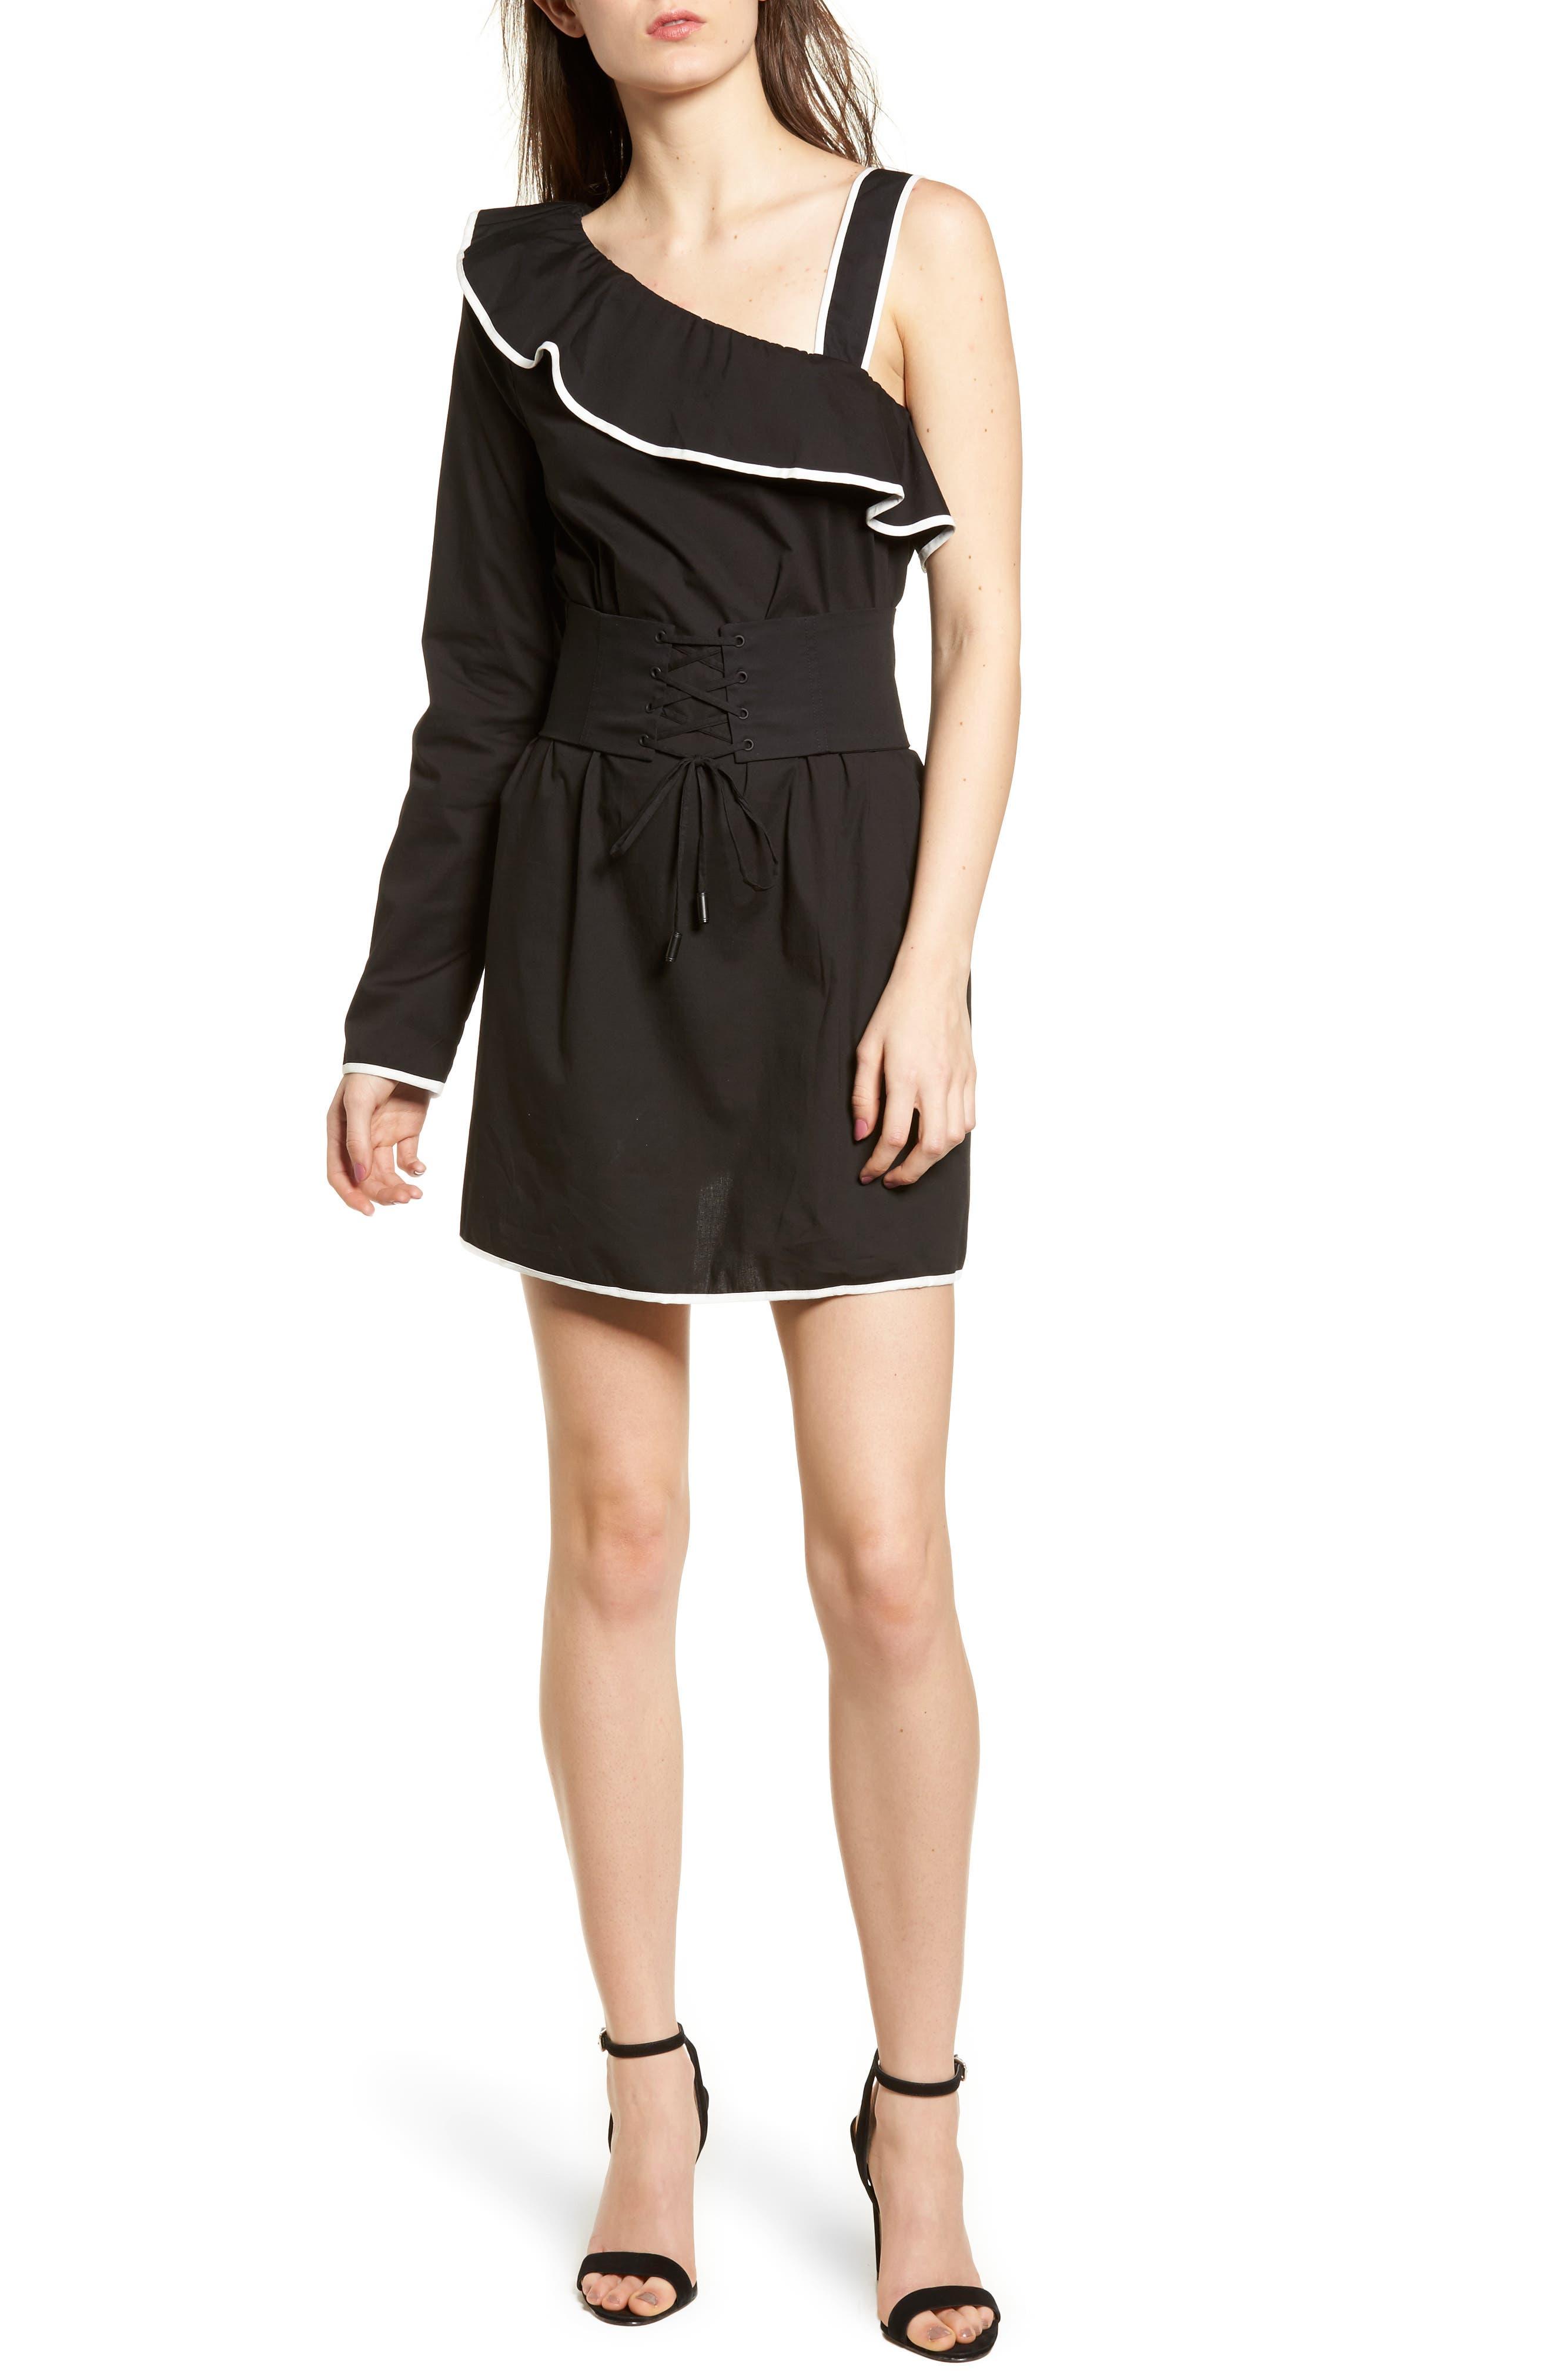 Helen One-Shoulder Ruffle Dress,                         Main,                         color, Black/ White